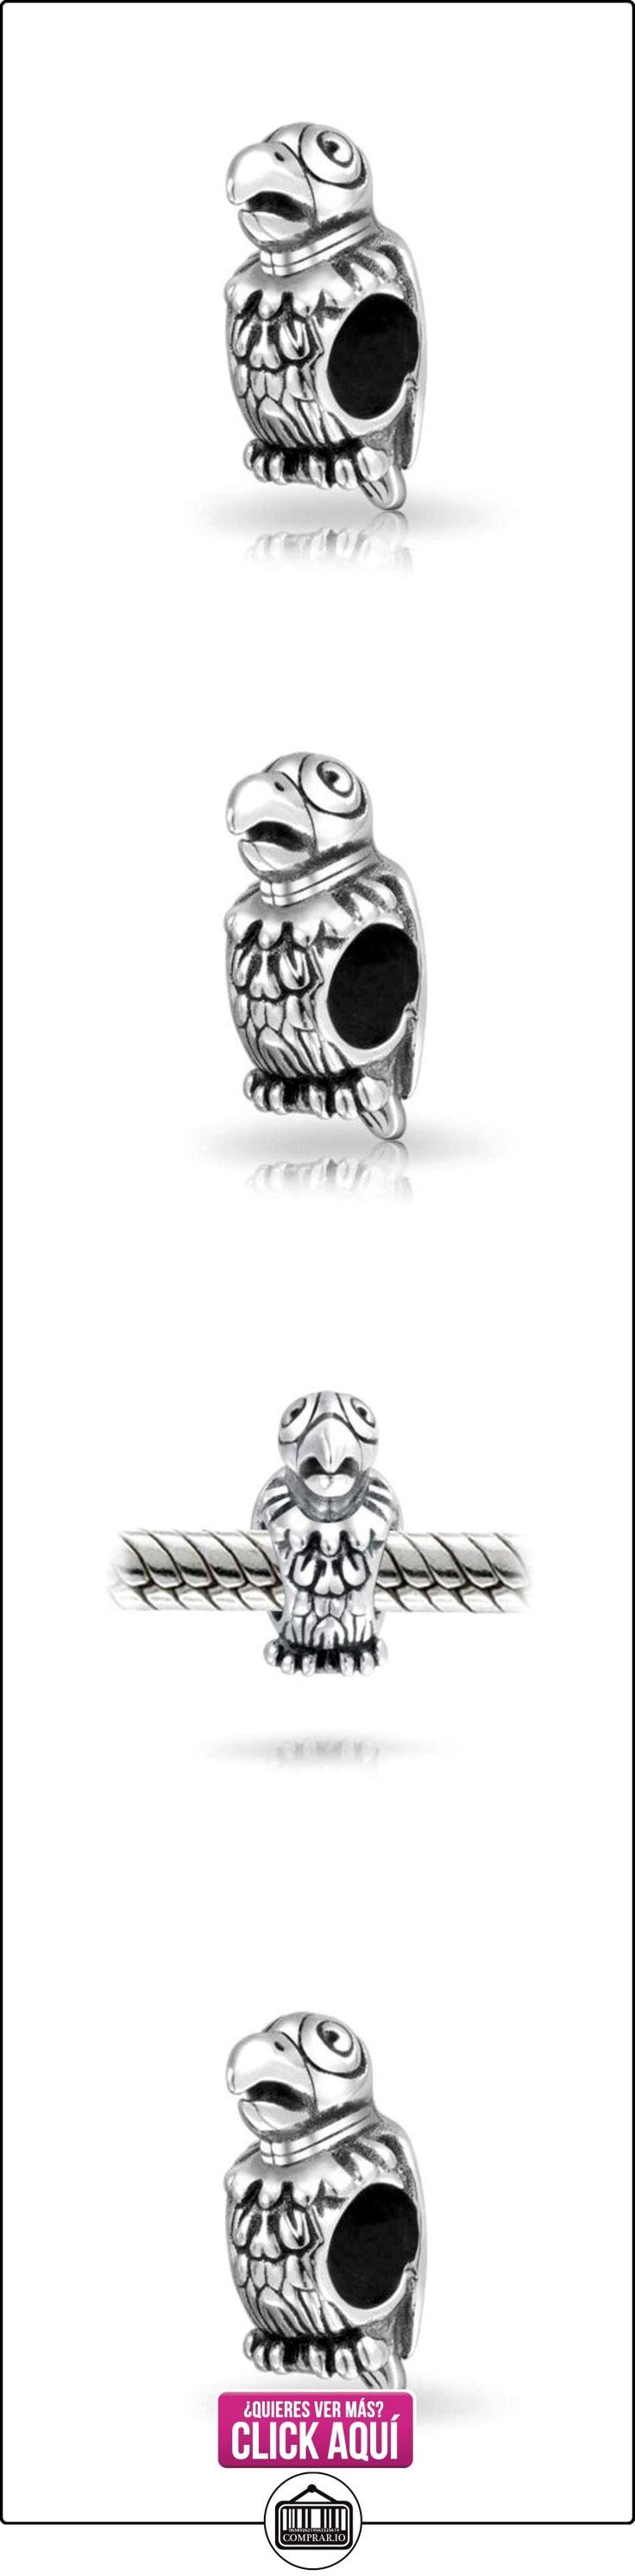 Bling Jewelry 925 Plata Animale Ave Loro Abalorio Encaja  ✿ Joyas para mujer - Las mejores ofertas ✿ ▬► Ver oferta: http://comprar.io/goto/B00FJE2JZ6